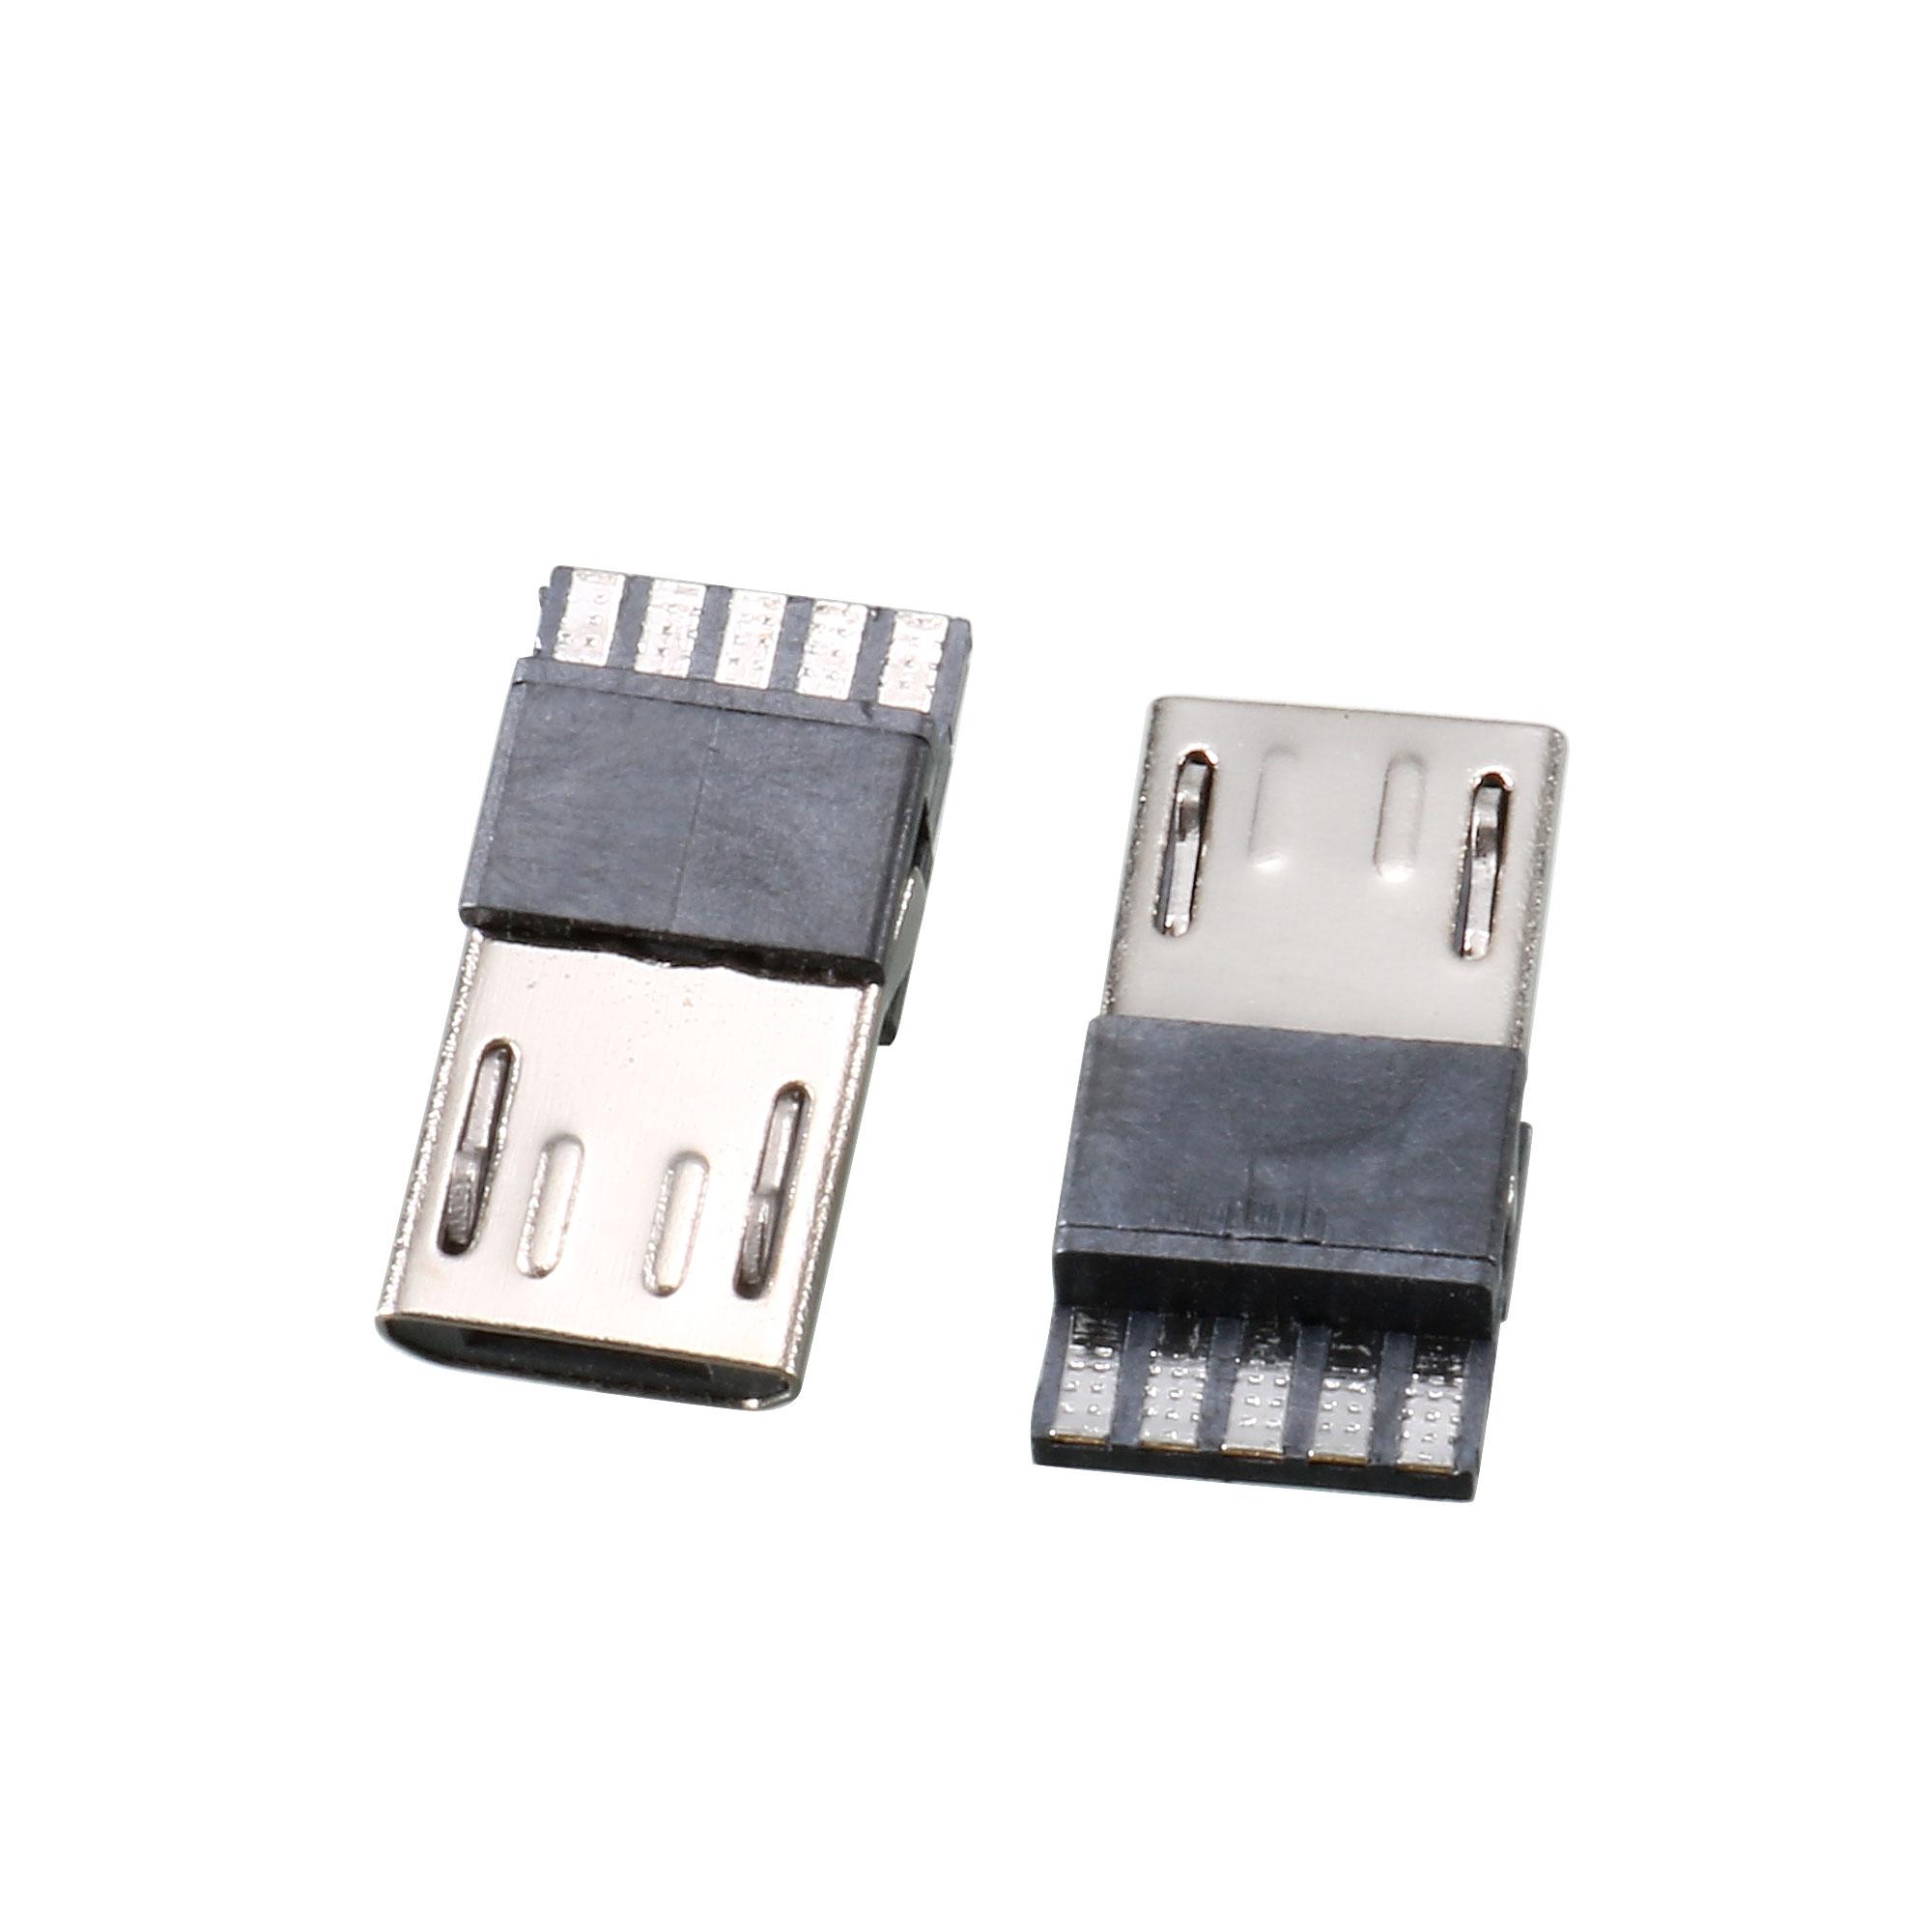 10 Pcs Micro USB Male Type B 5 Terminal Jack Port Solder Connector